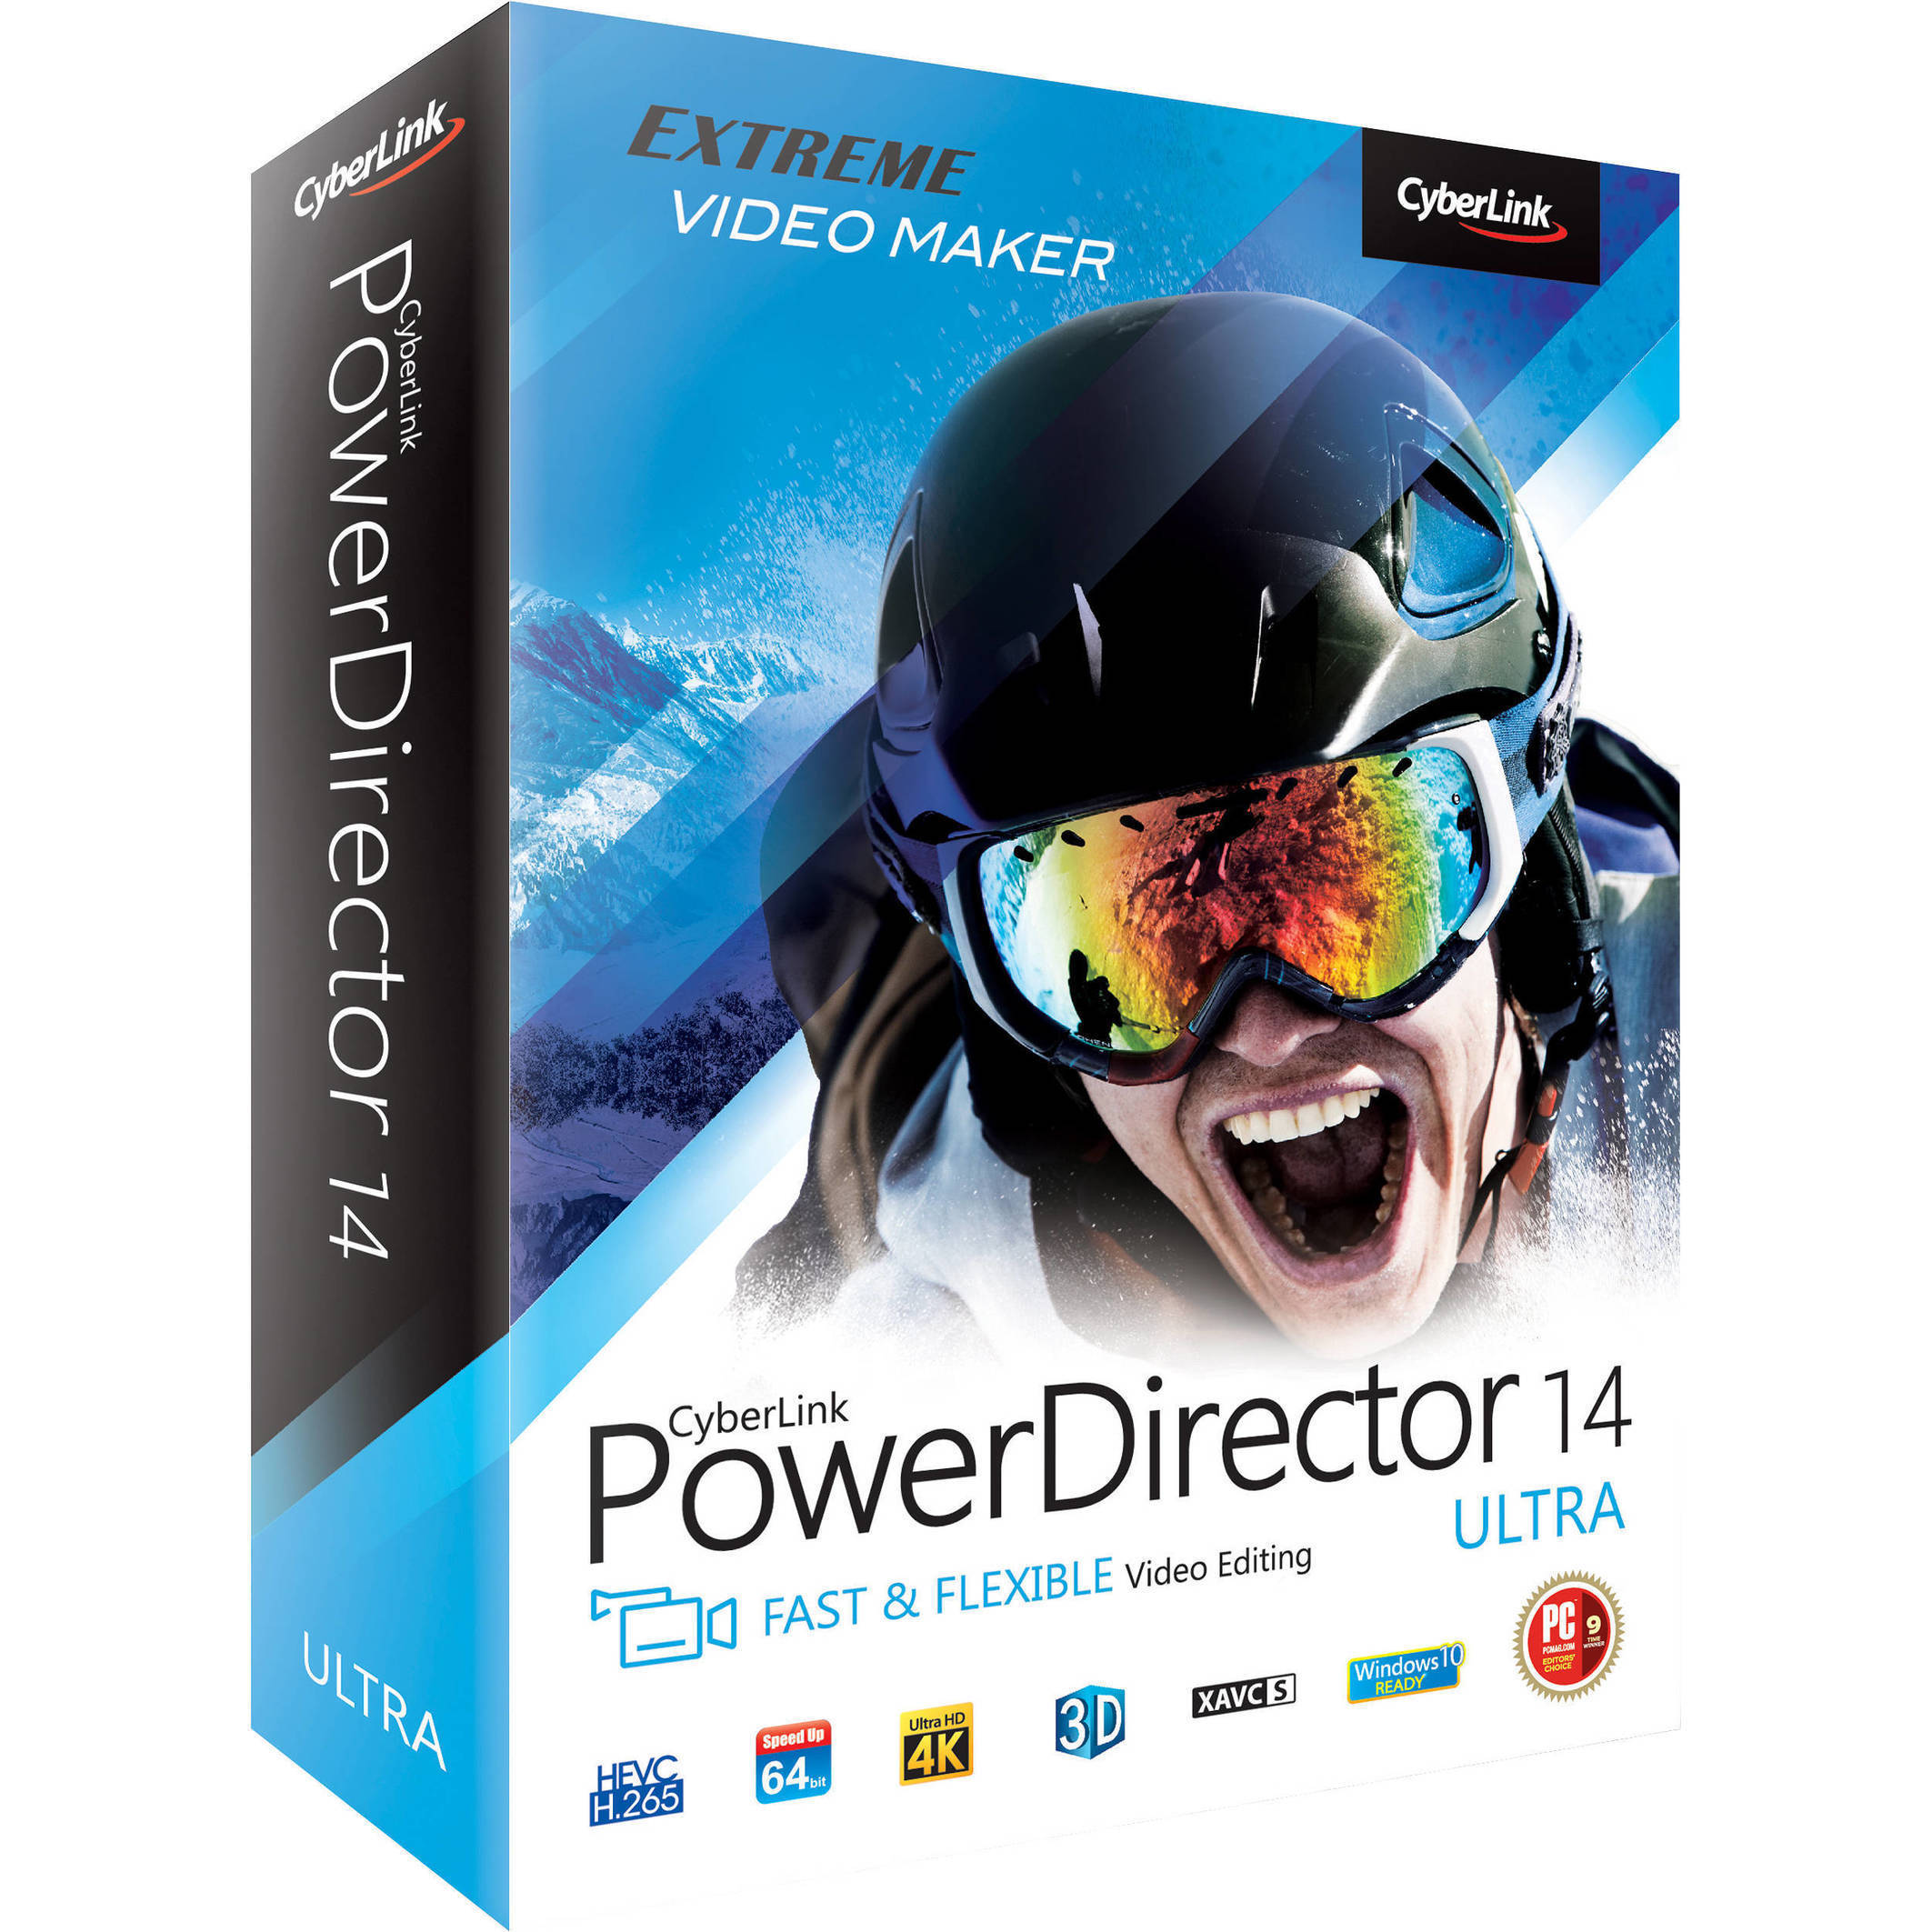 cyberlink powerdirector 8 registration key